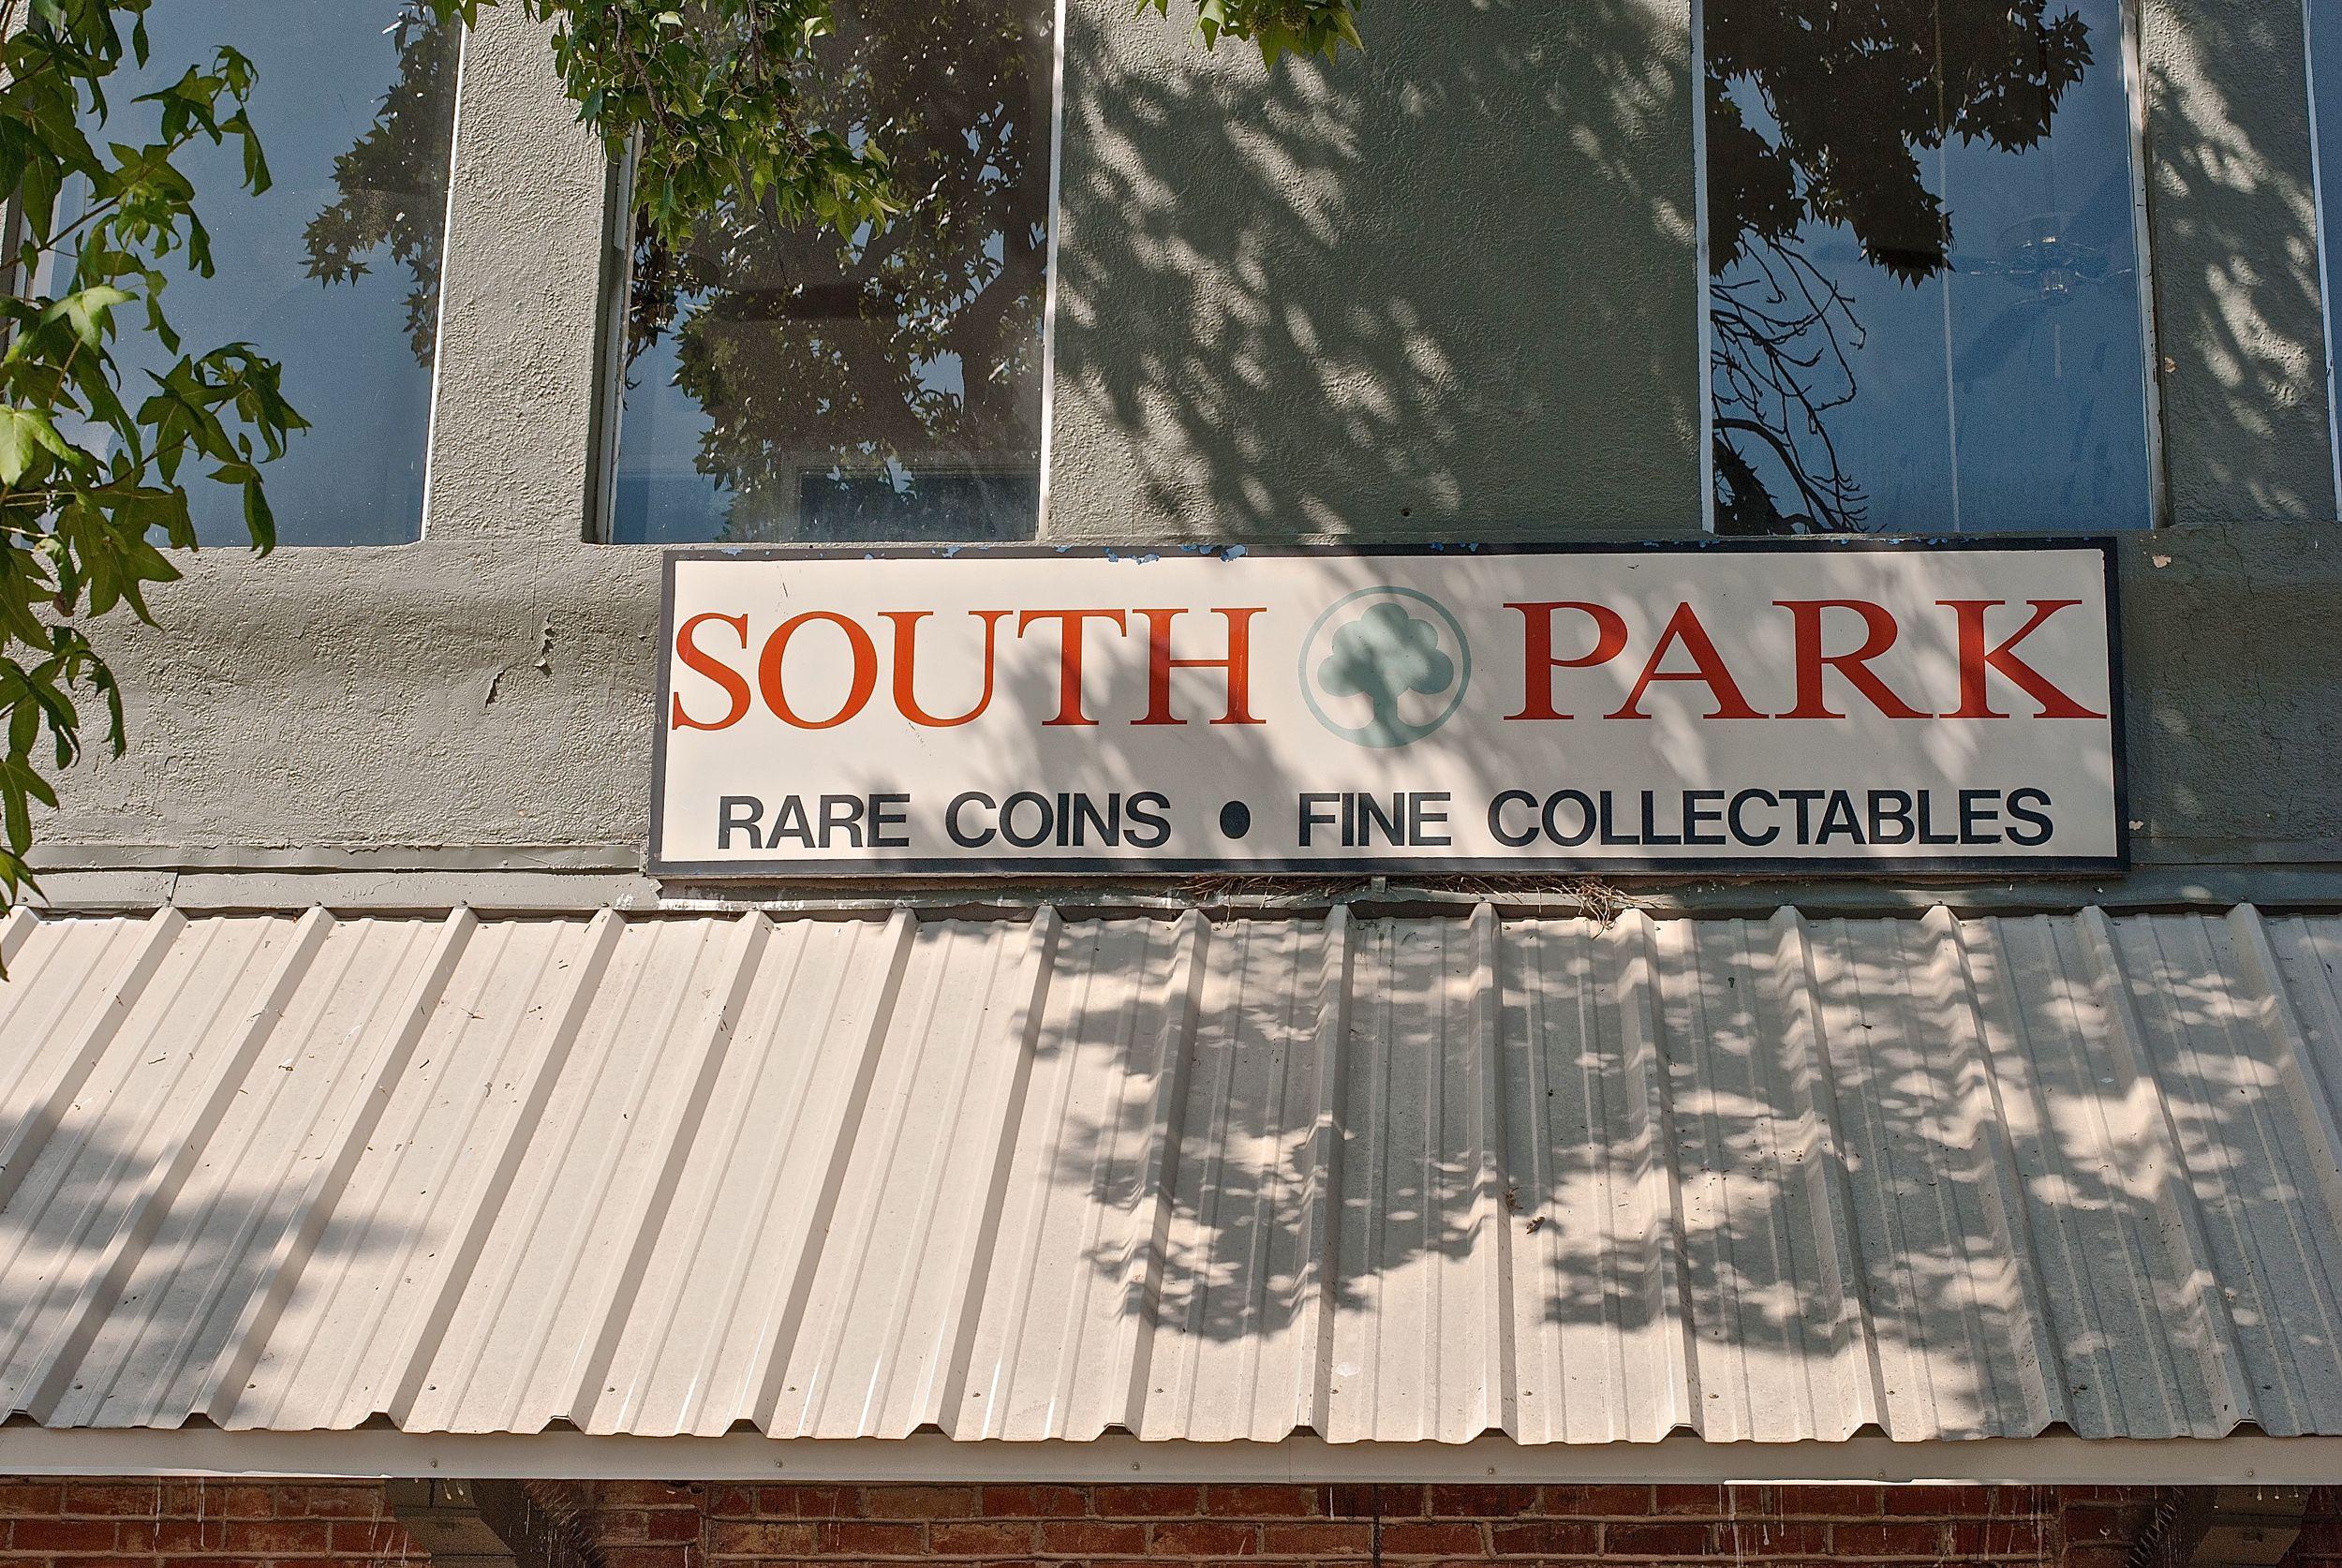 South Park Coins